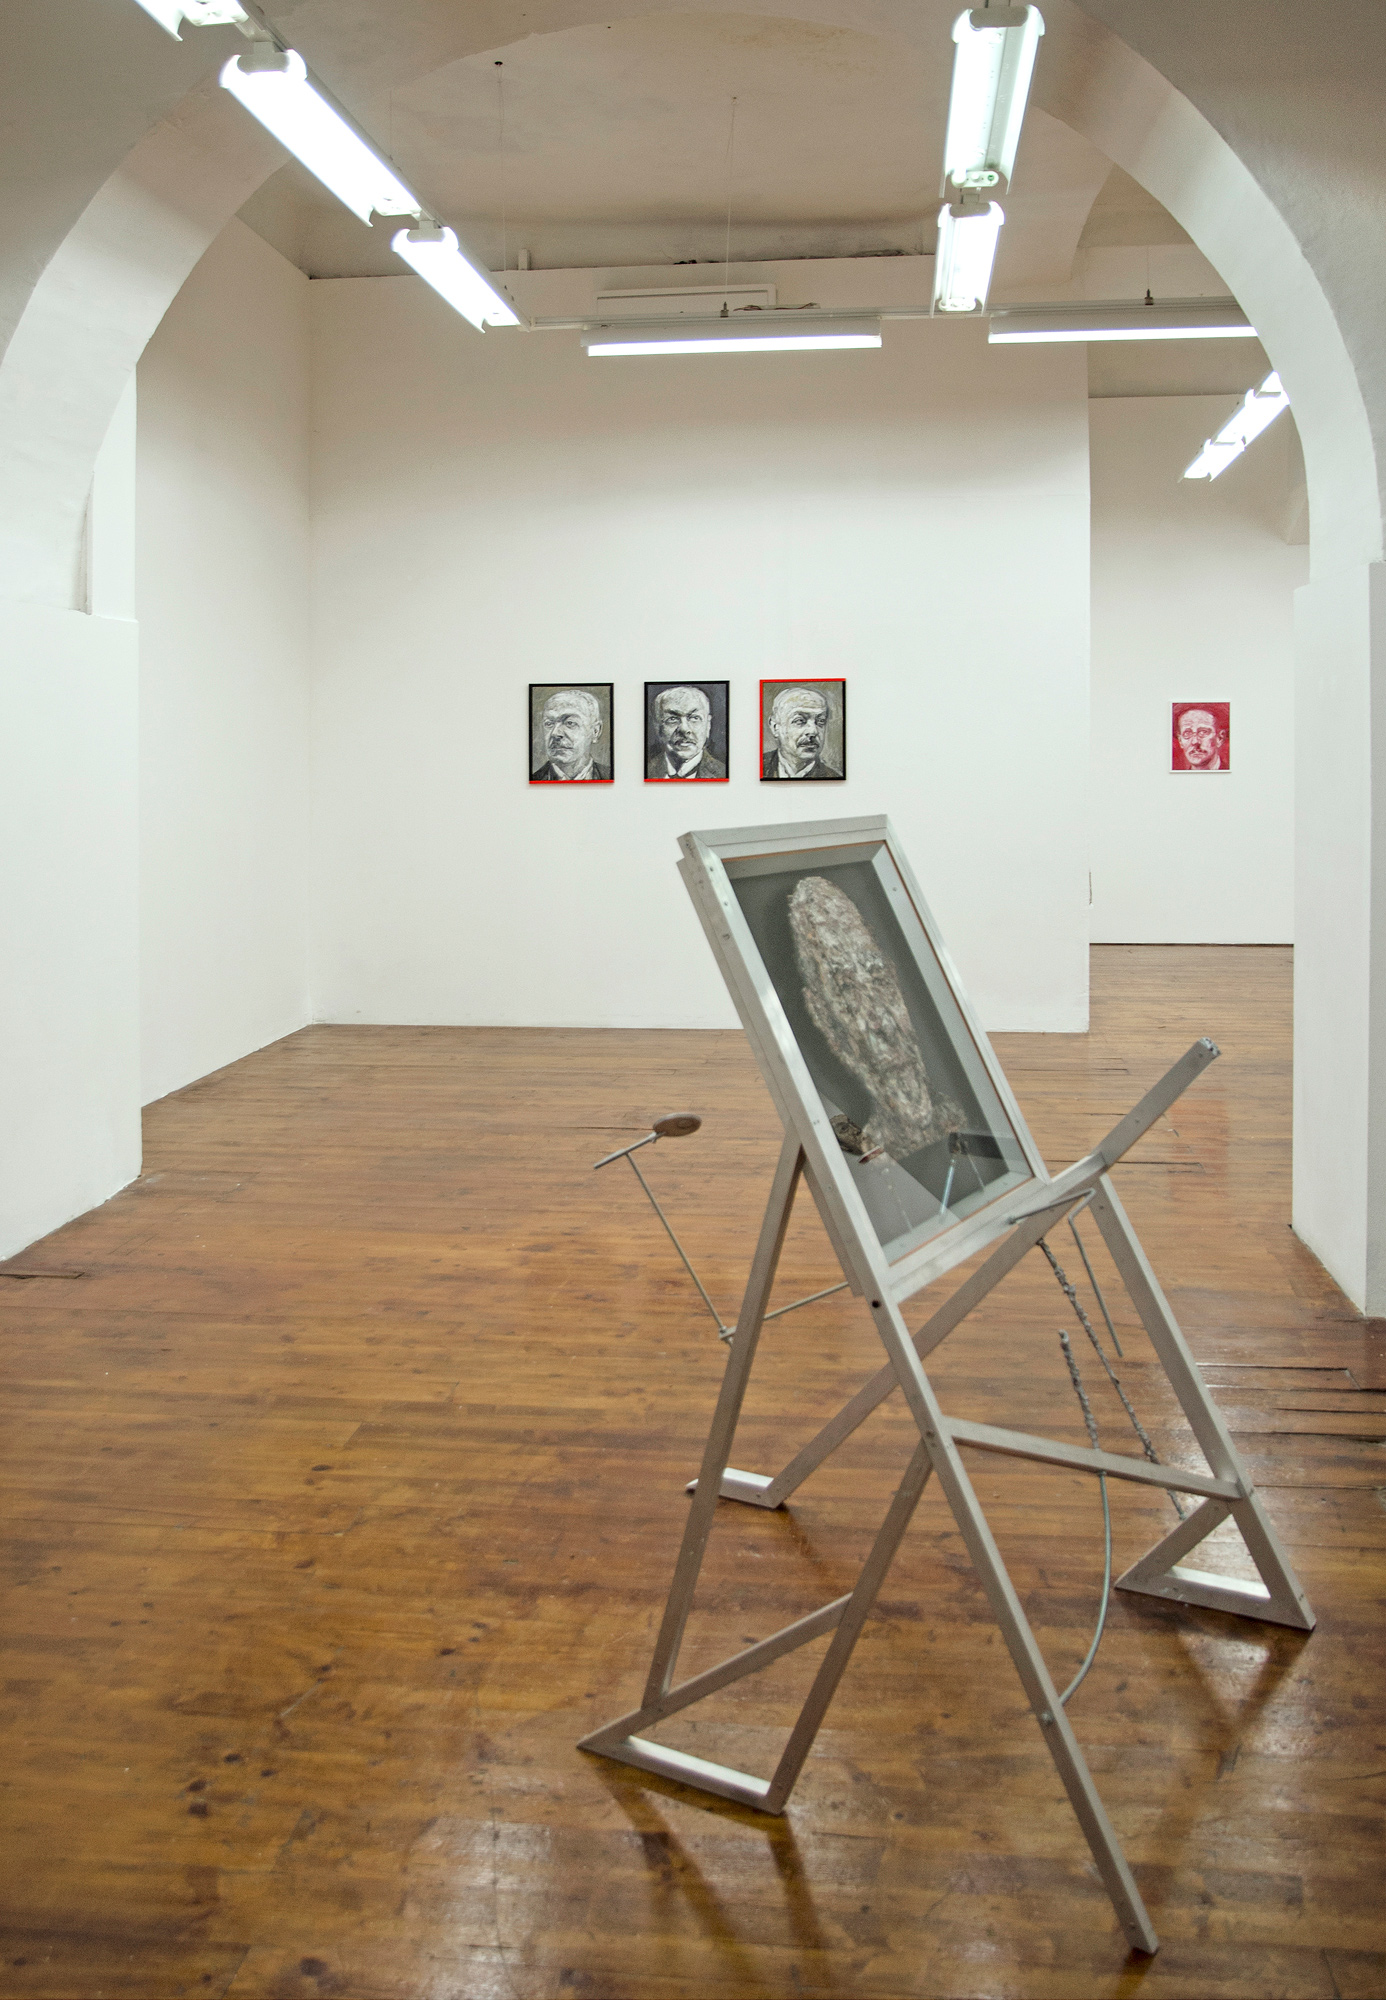 Aleksander Velišček, veduta della mostra, 2017, MLZ Art Dep